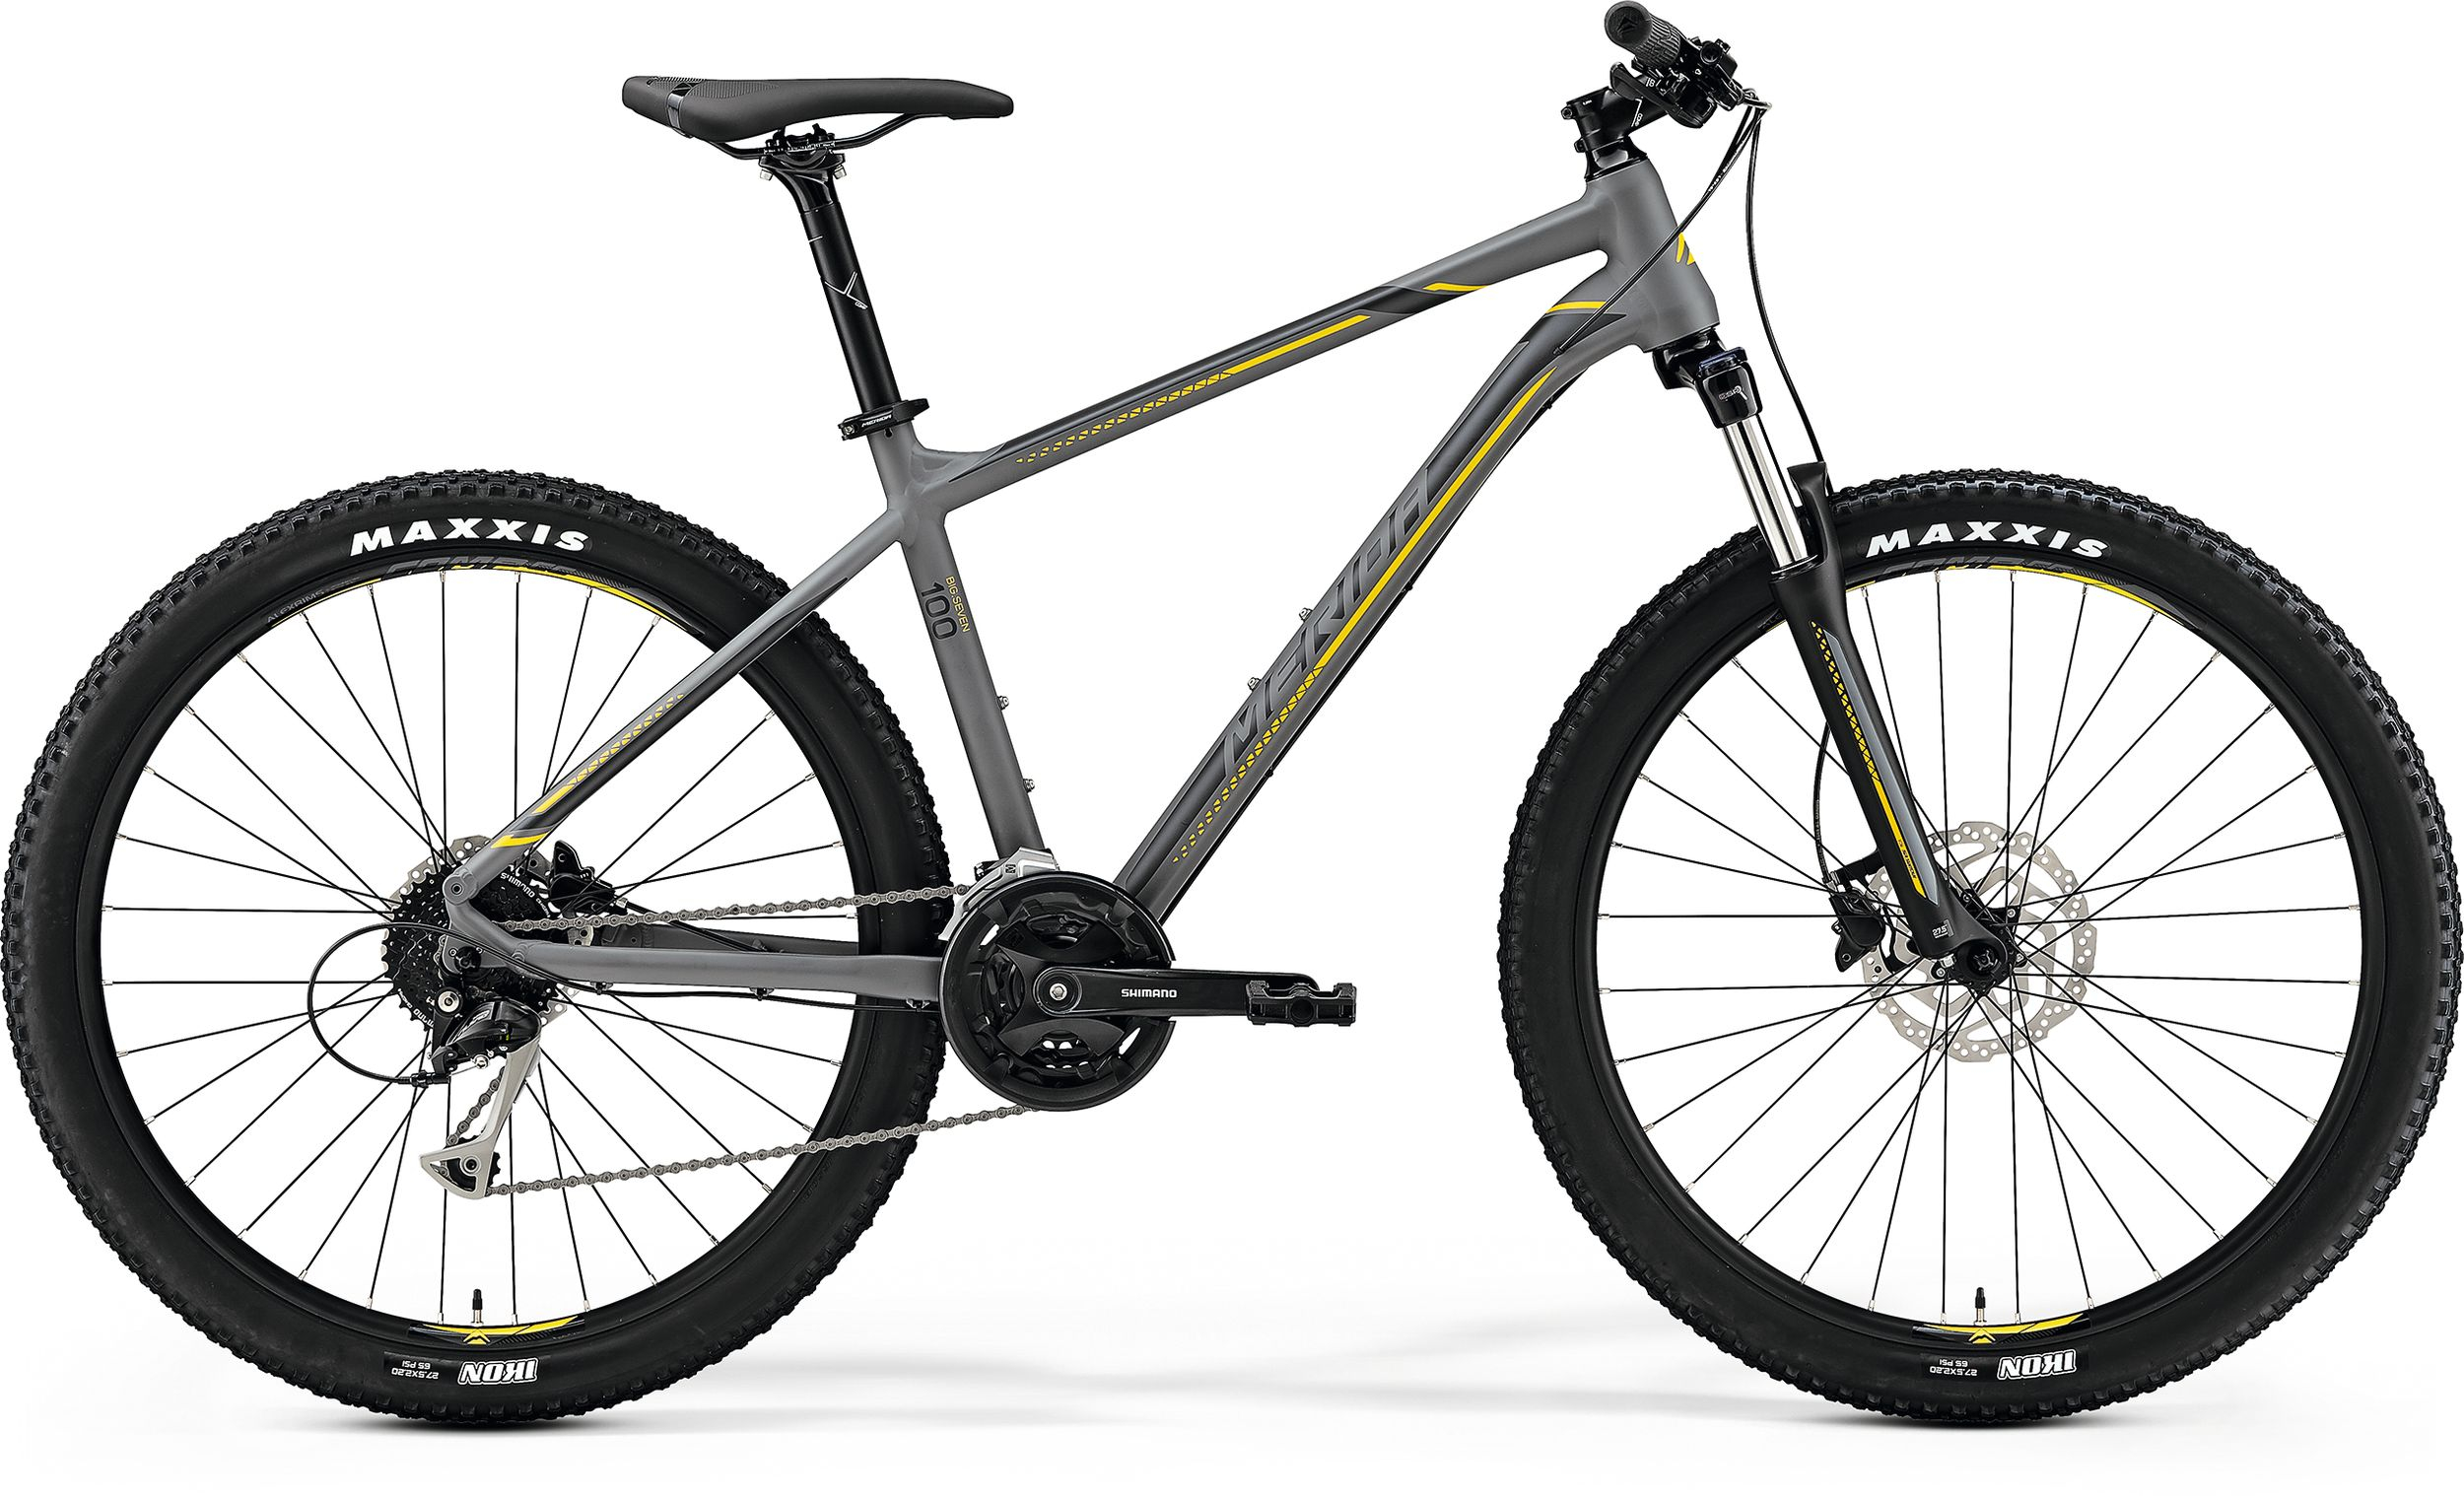 Bicicleta de munte pentru barbati Merida Big.Seven 100 Gri(Galben) 2019 imagine